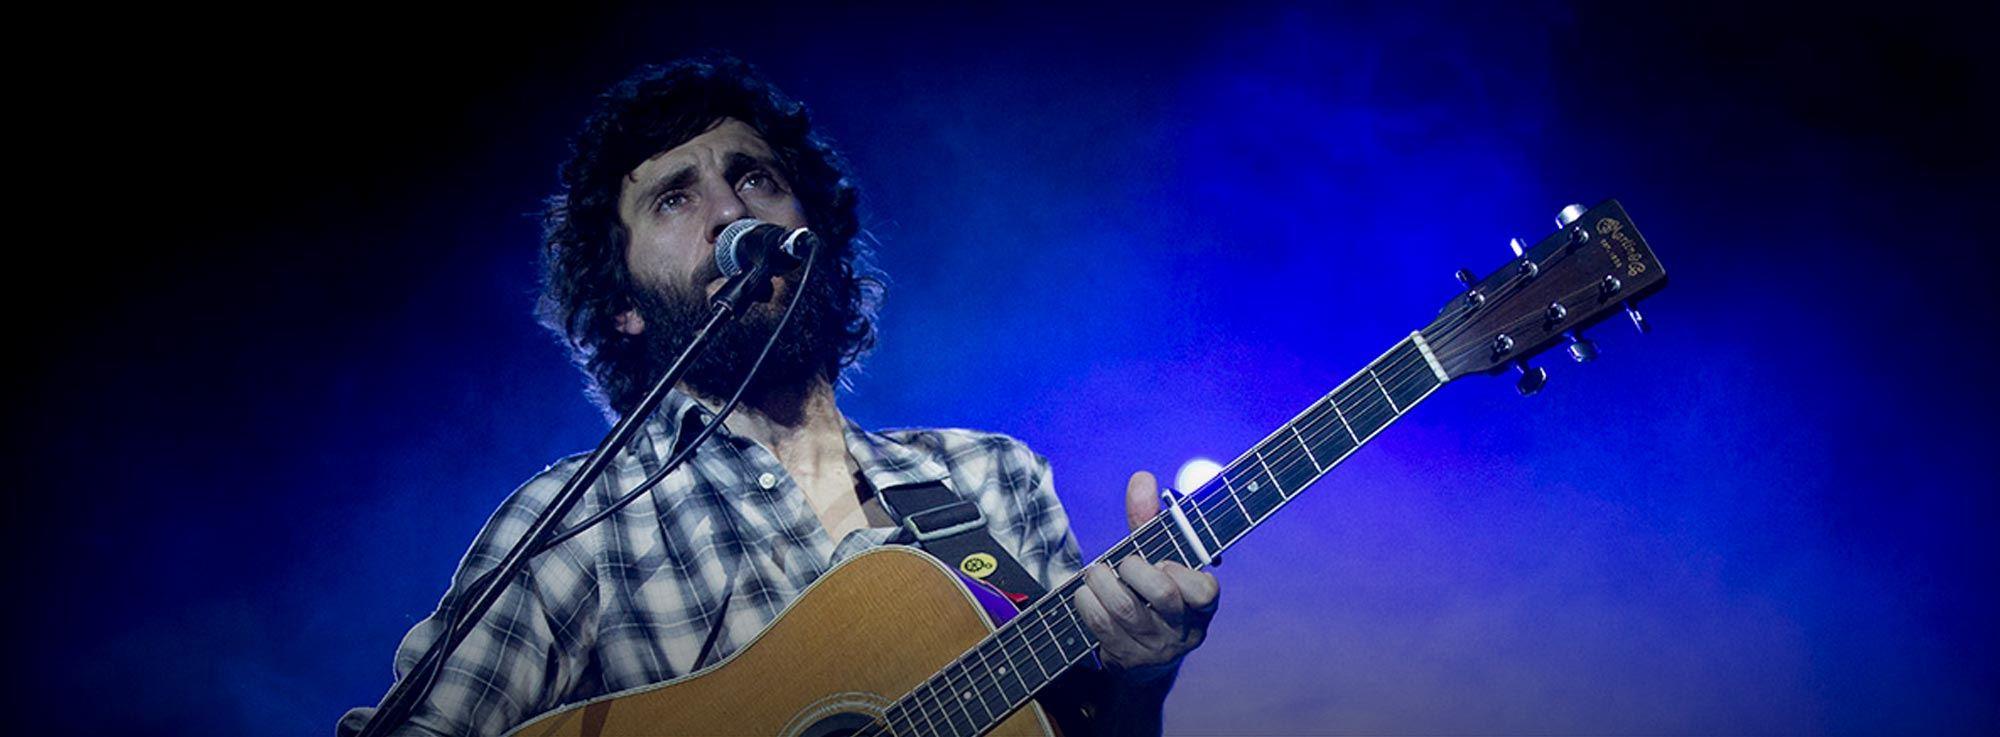 Lecce: Emanuele Colandrea Live